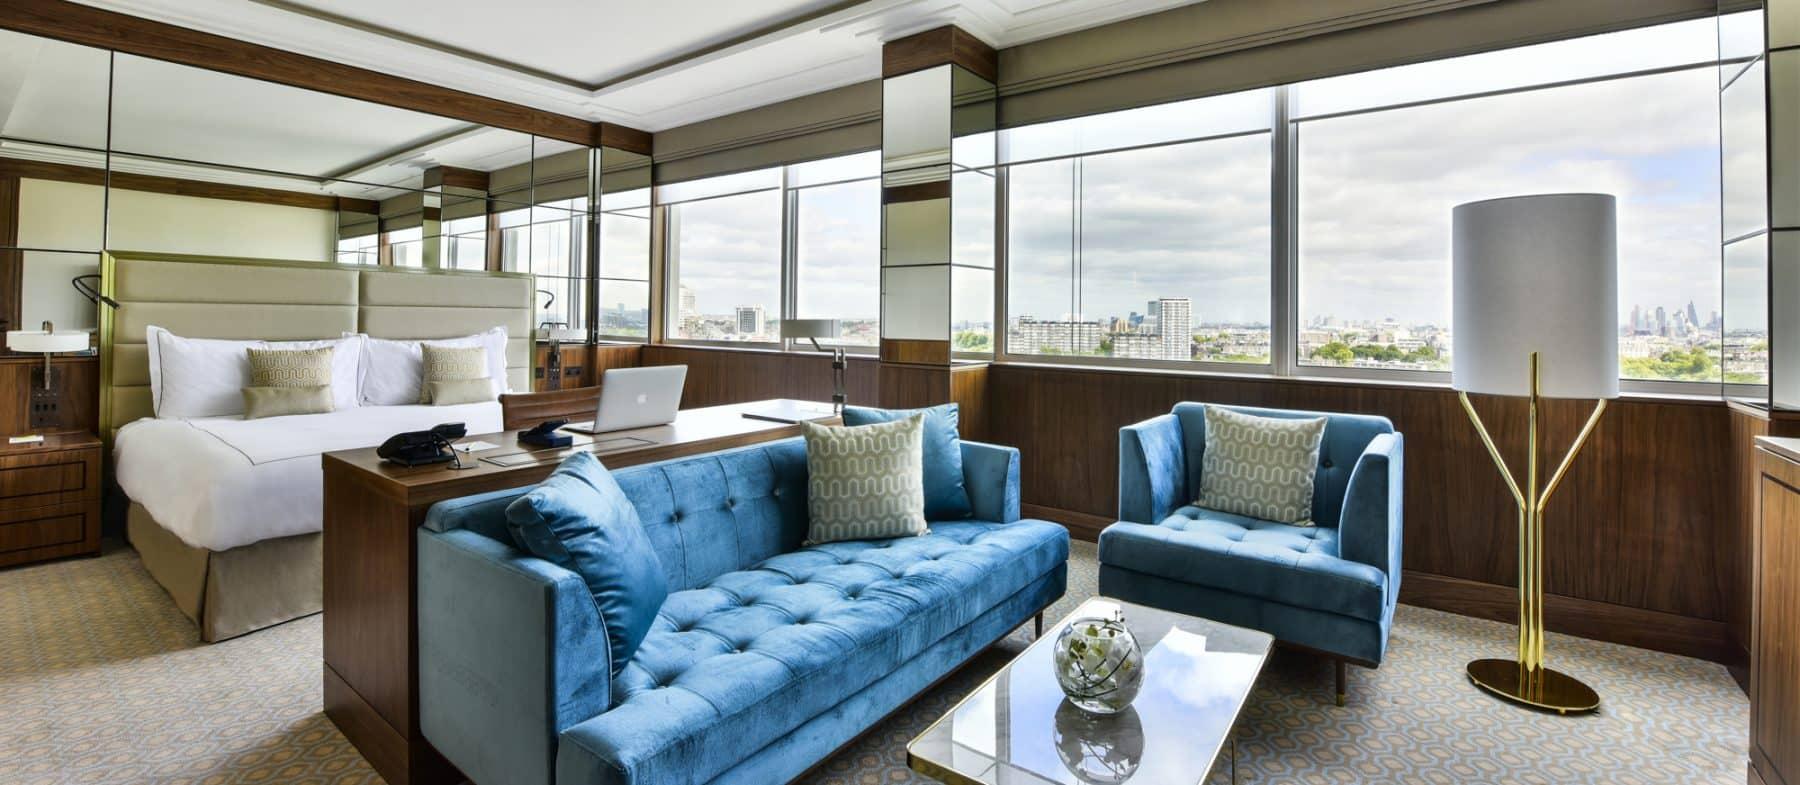 Luxury Hotel Rooms London near Hyde Park